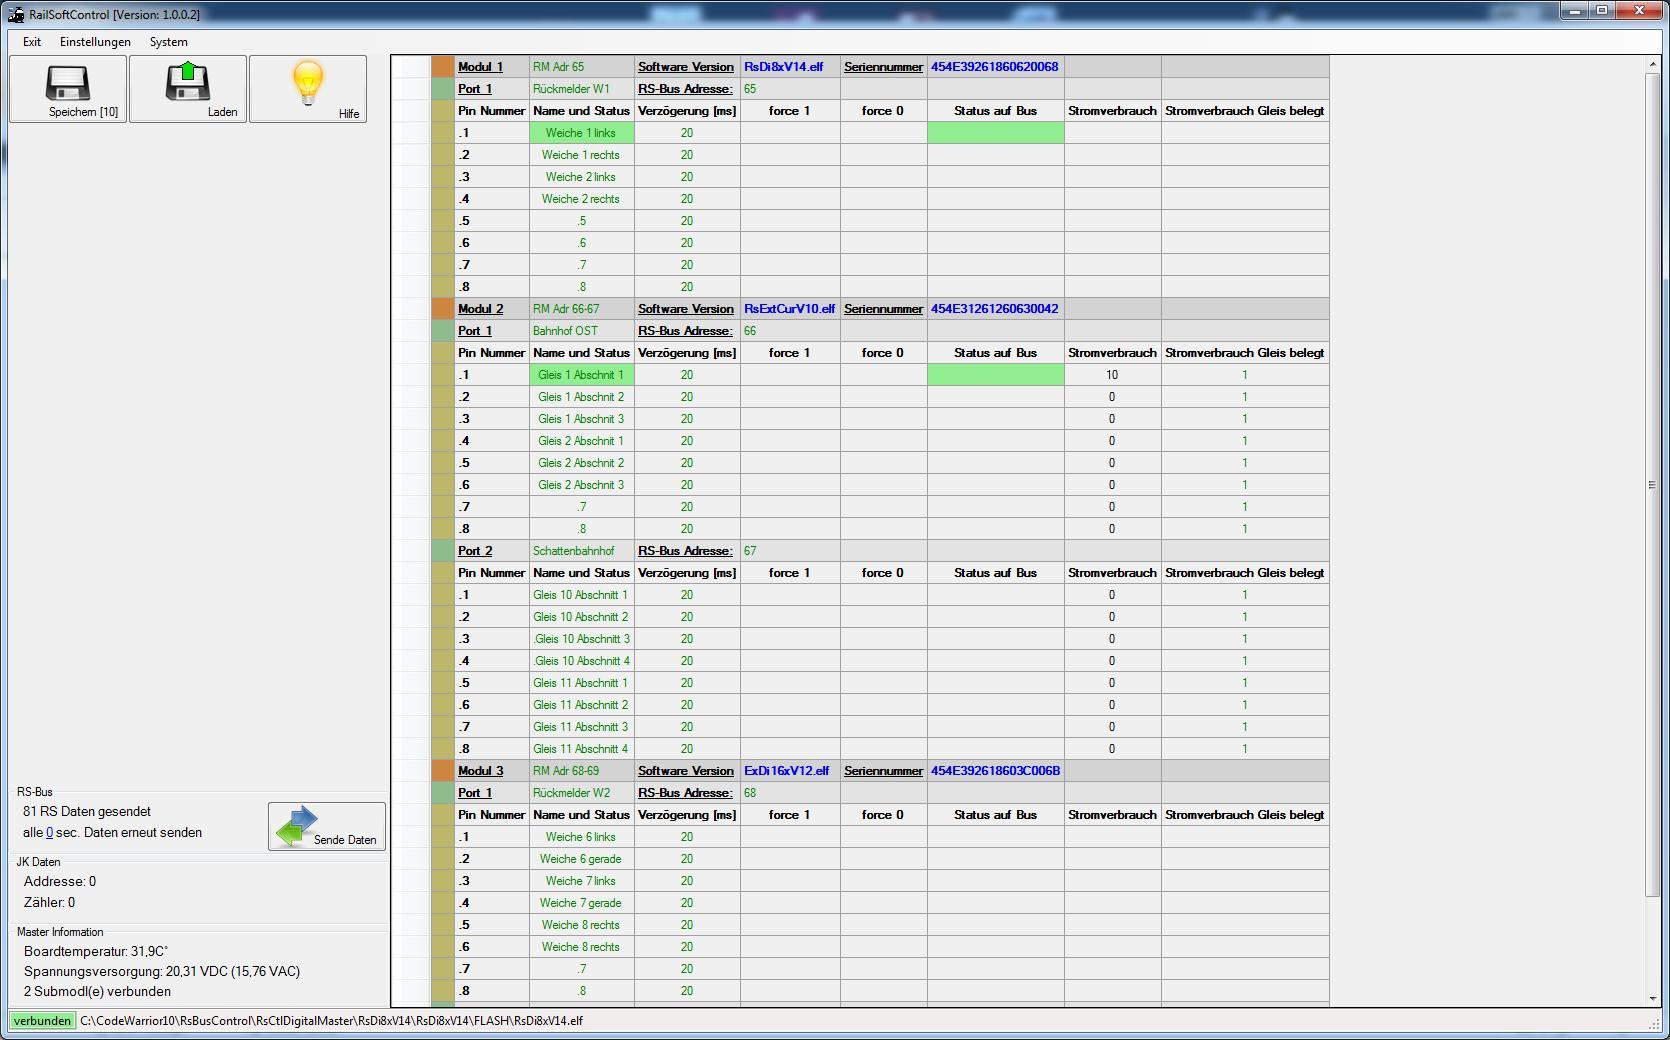 Download RailComSoftware